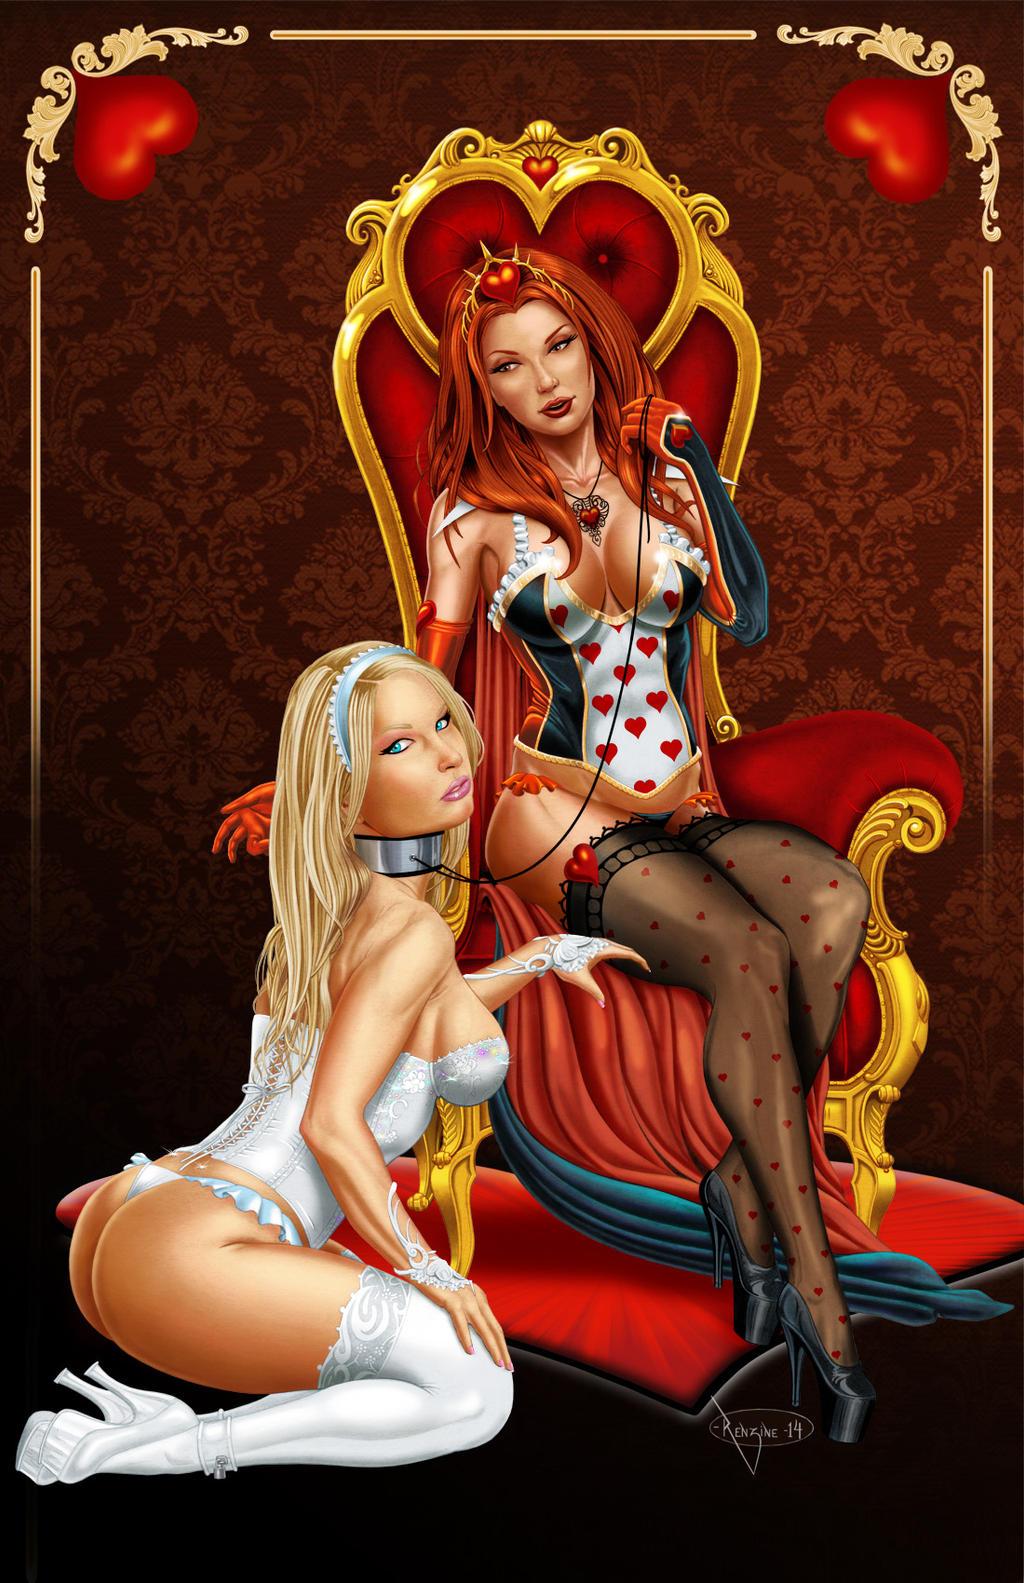 Wonderland art 3d erotic